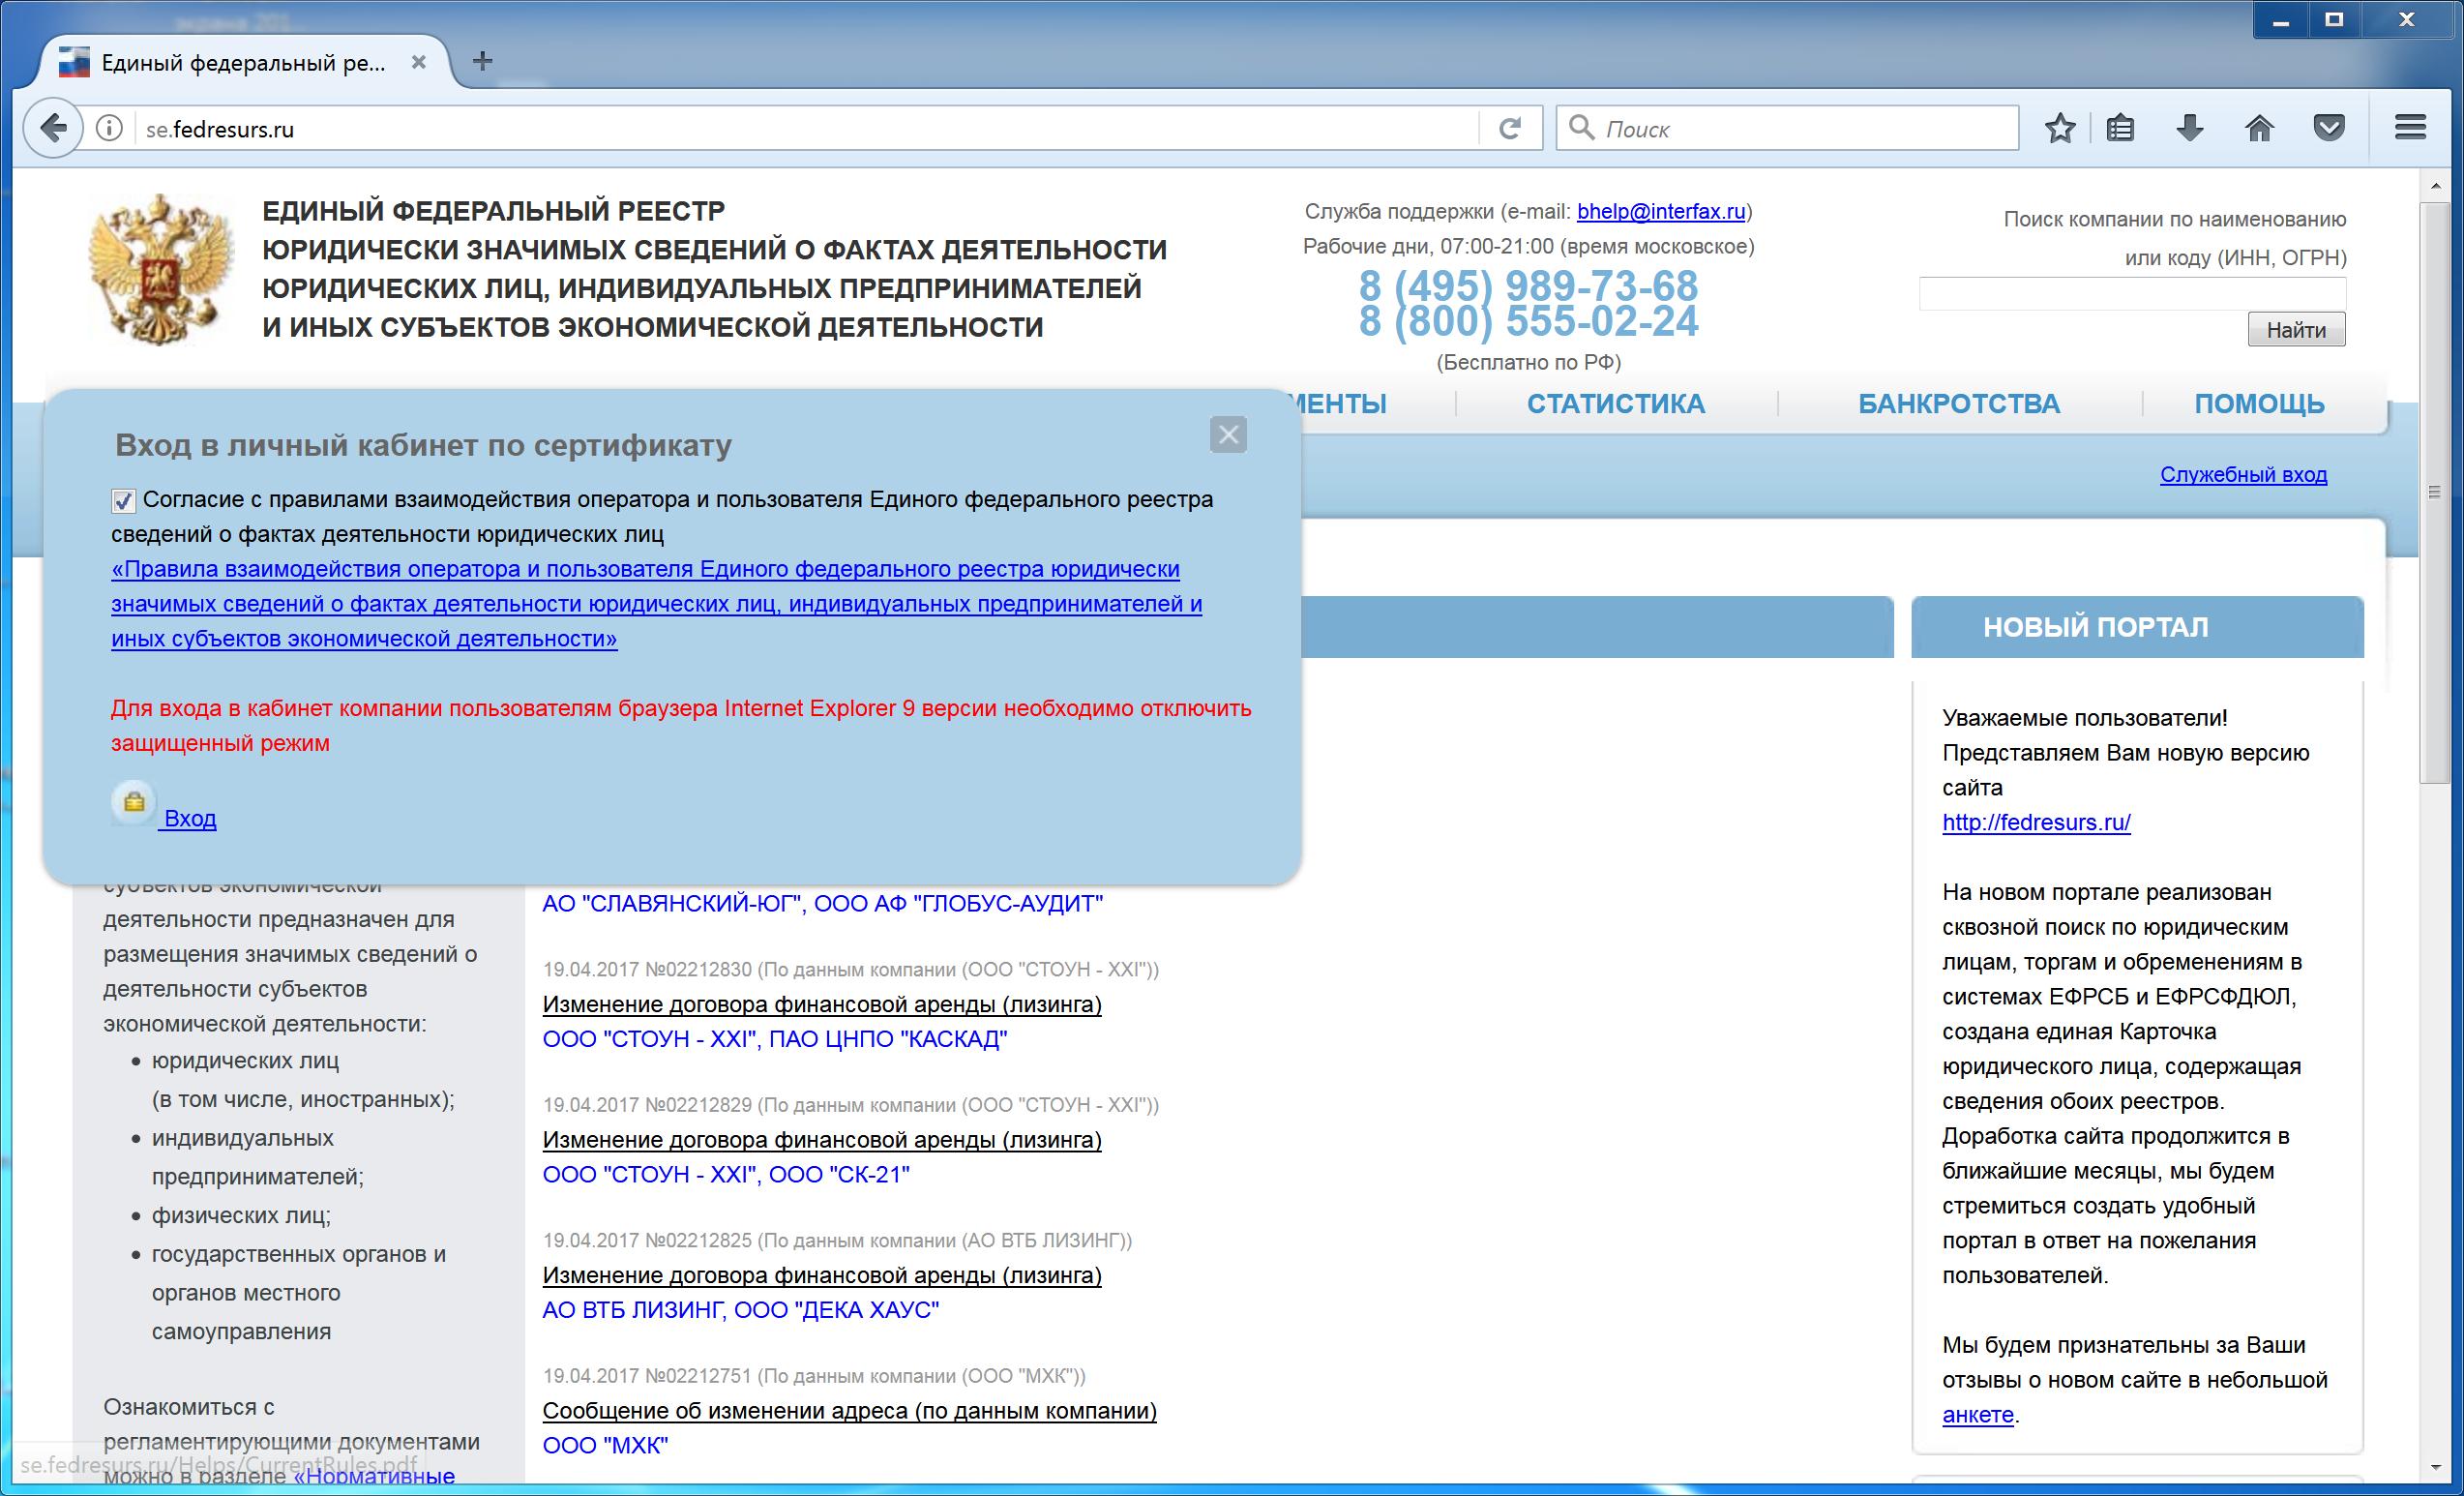 Экран входа на сайт fedresurs